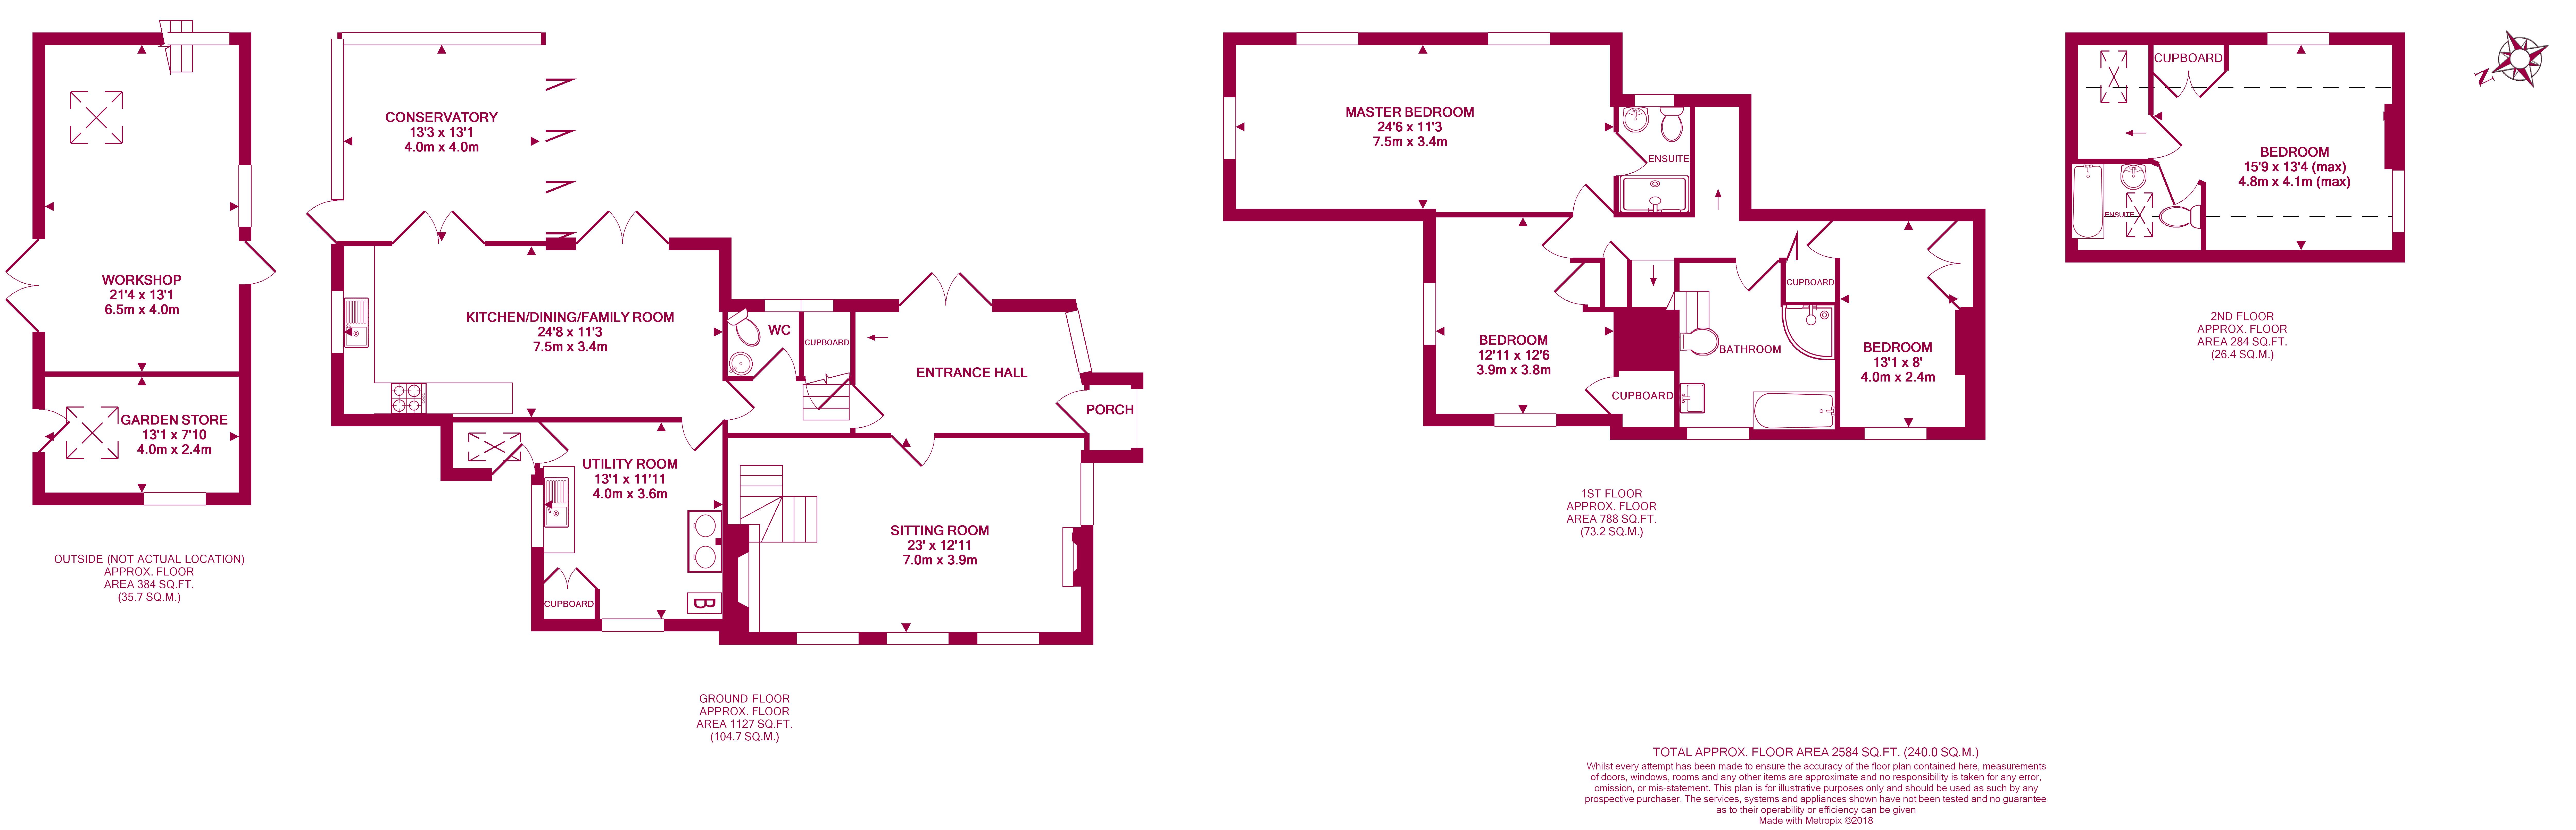 Footbridge Winchcombe Cheltenham Gl54 4 Bedroom Detached House Average Cost Of Rewiring A 5 View Original